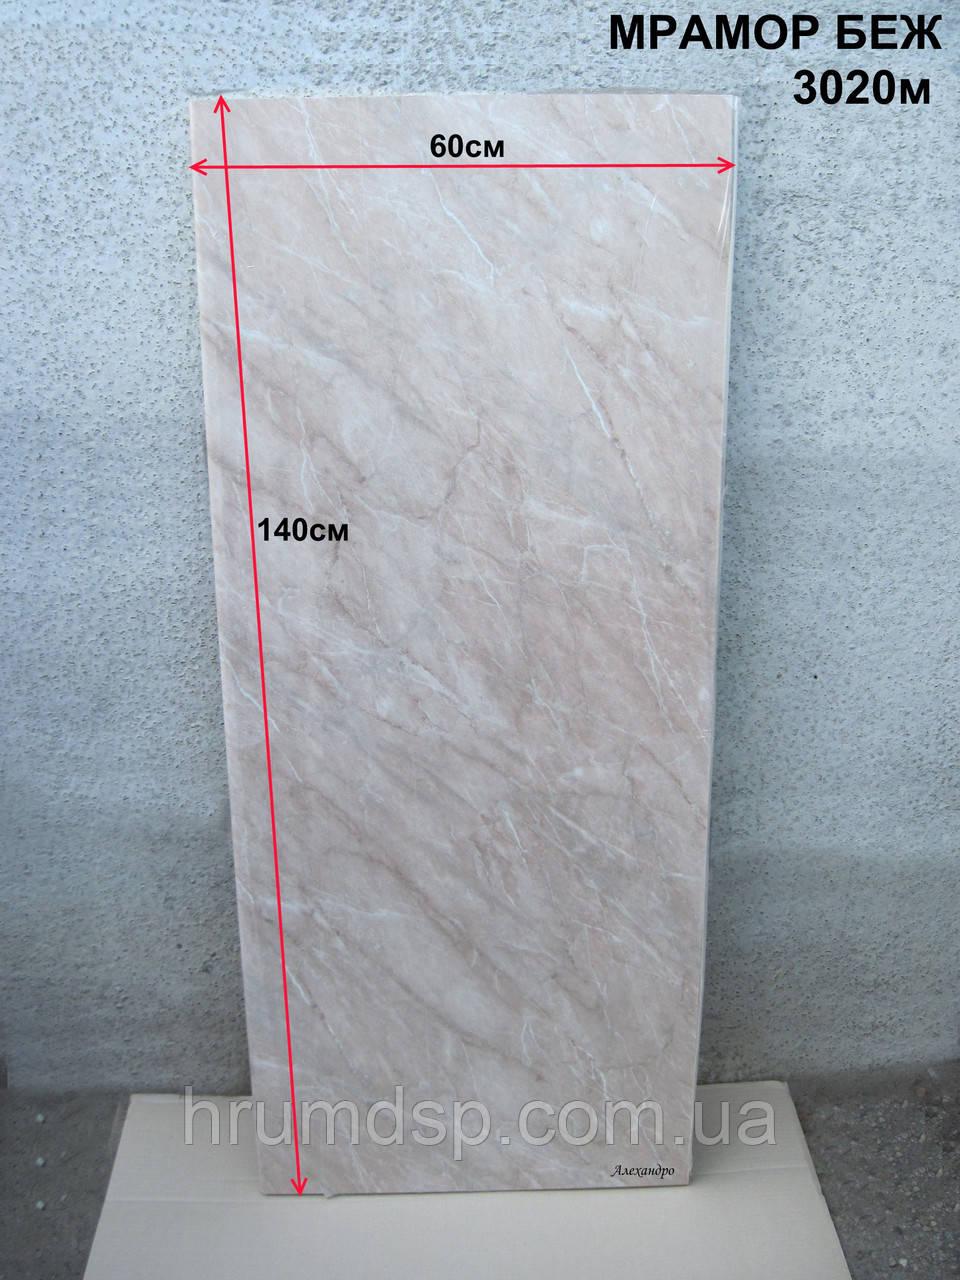 Столешница 140см (толщина 28мм)